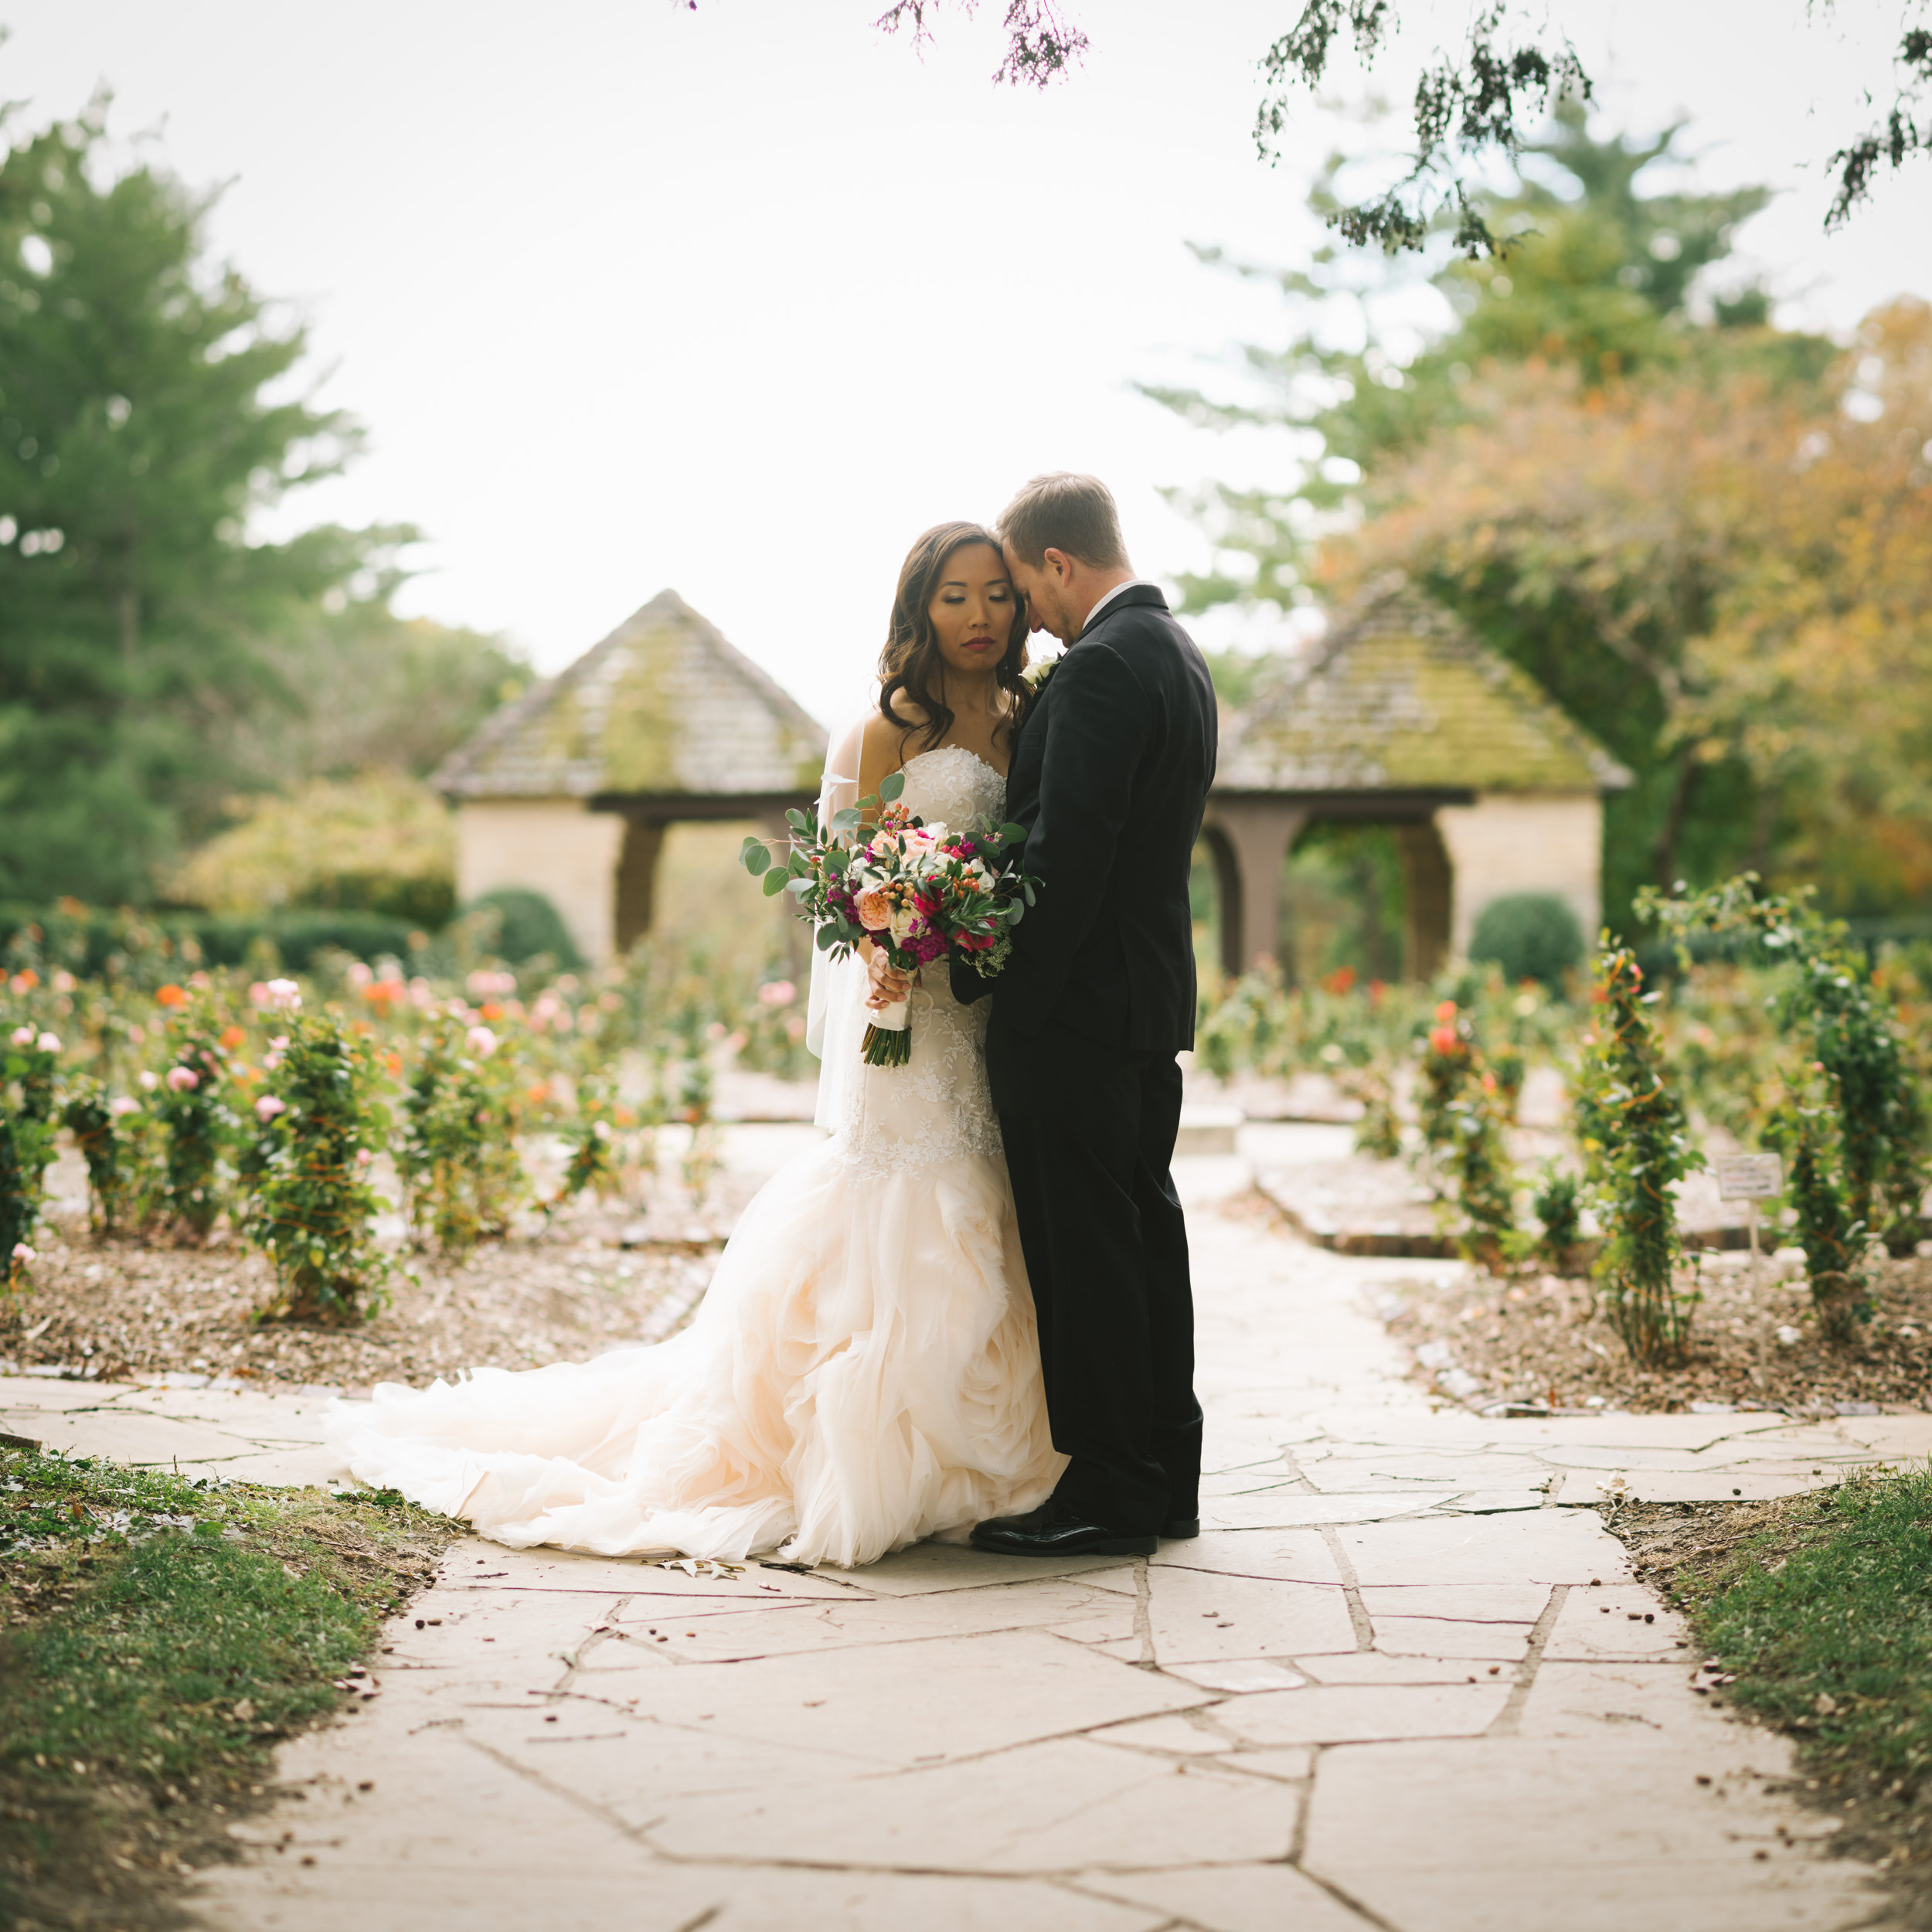 20171029_Wedding-Kristin-Garrett-305.jpg